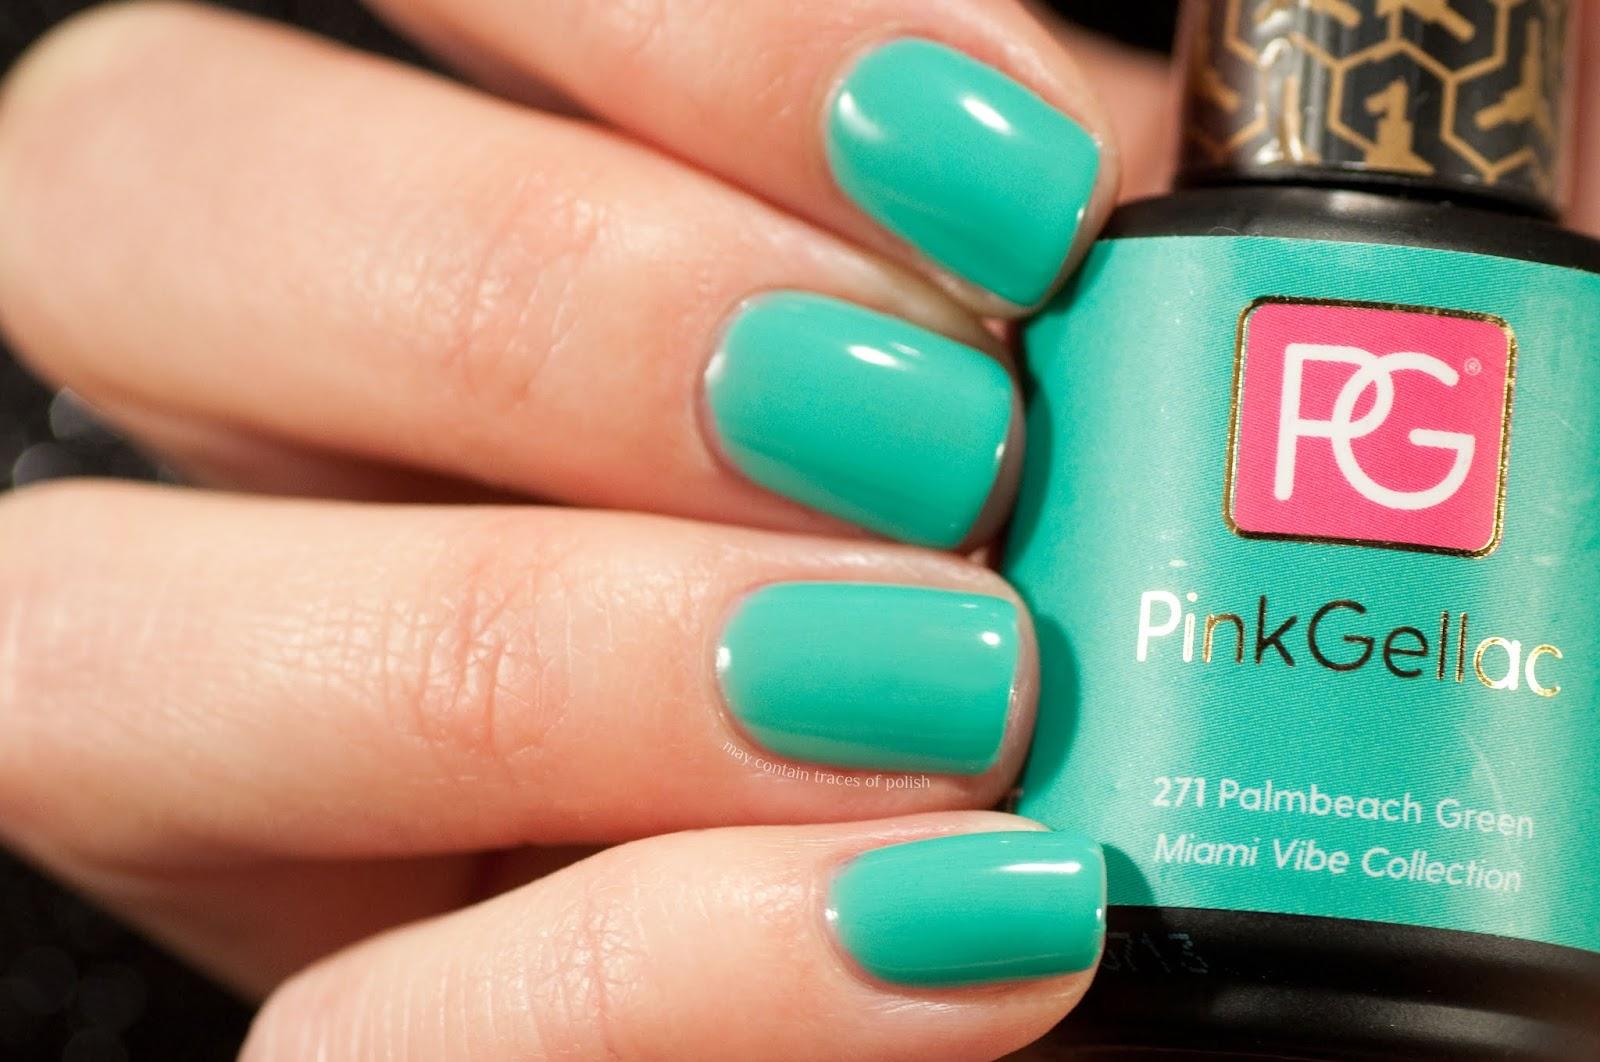 Pink Gellac Swatches -  271 Palmbeach Green